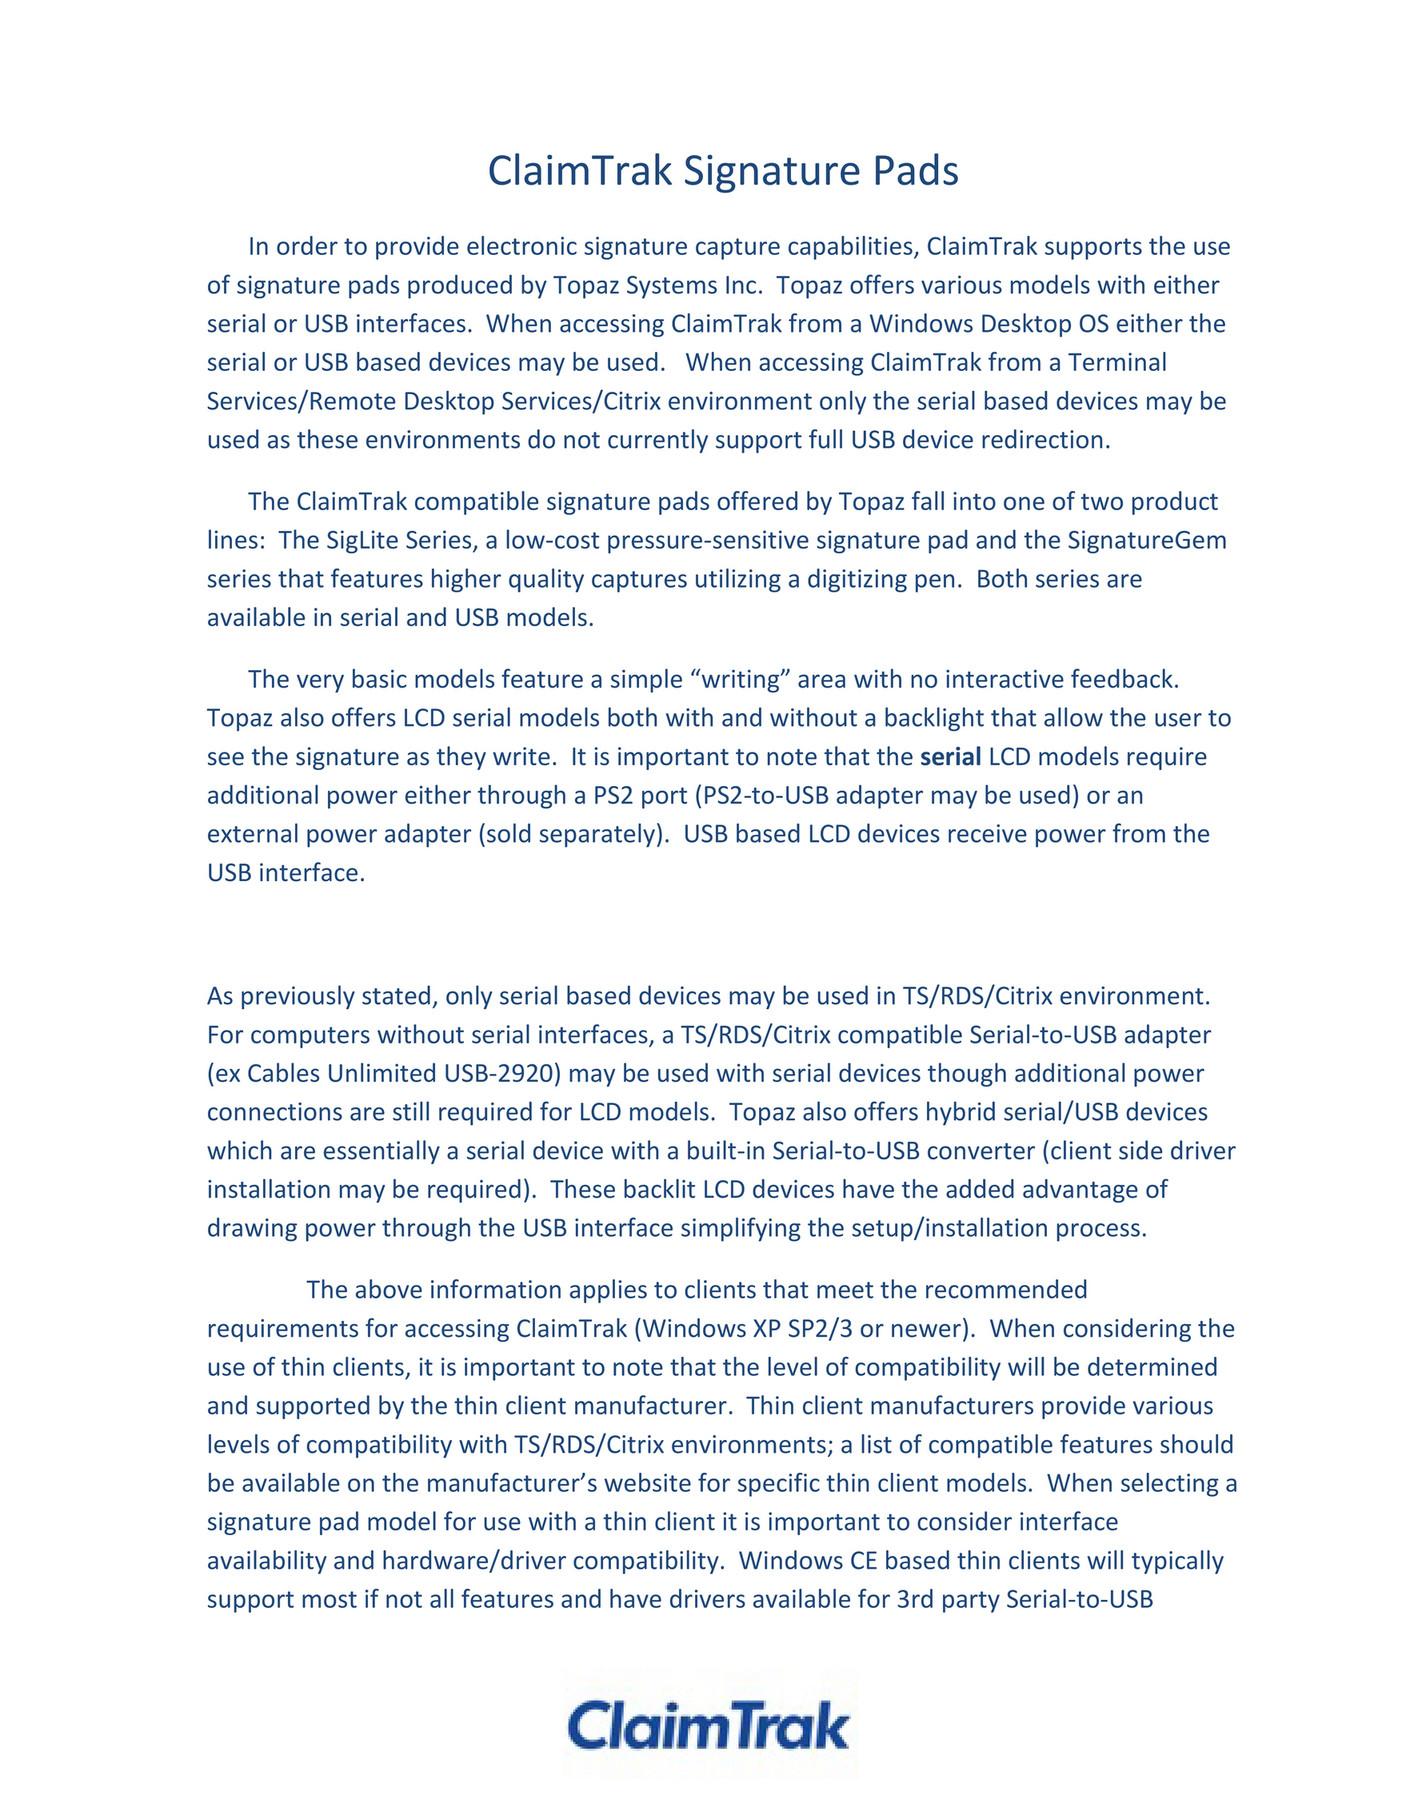 ClaimTrak - ClaimTrak Signature Pad Guidance - Page 2-3